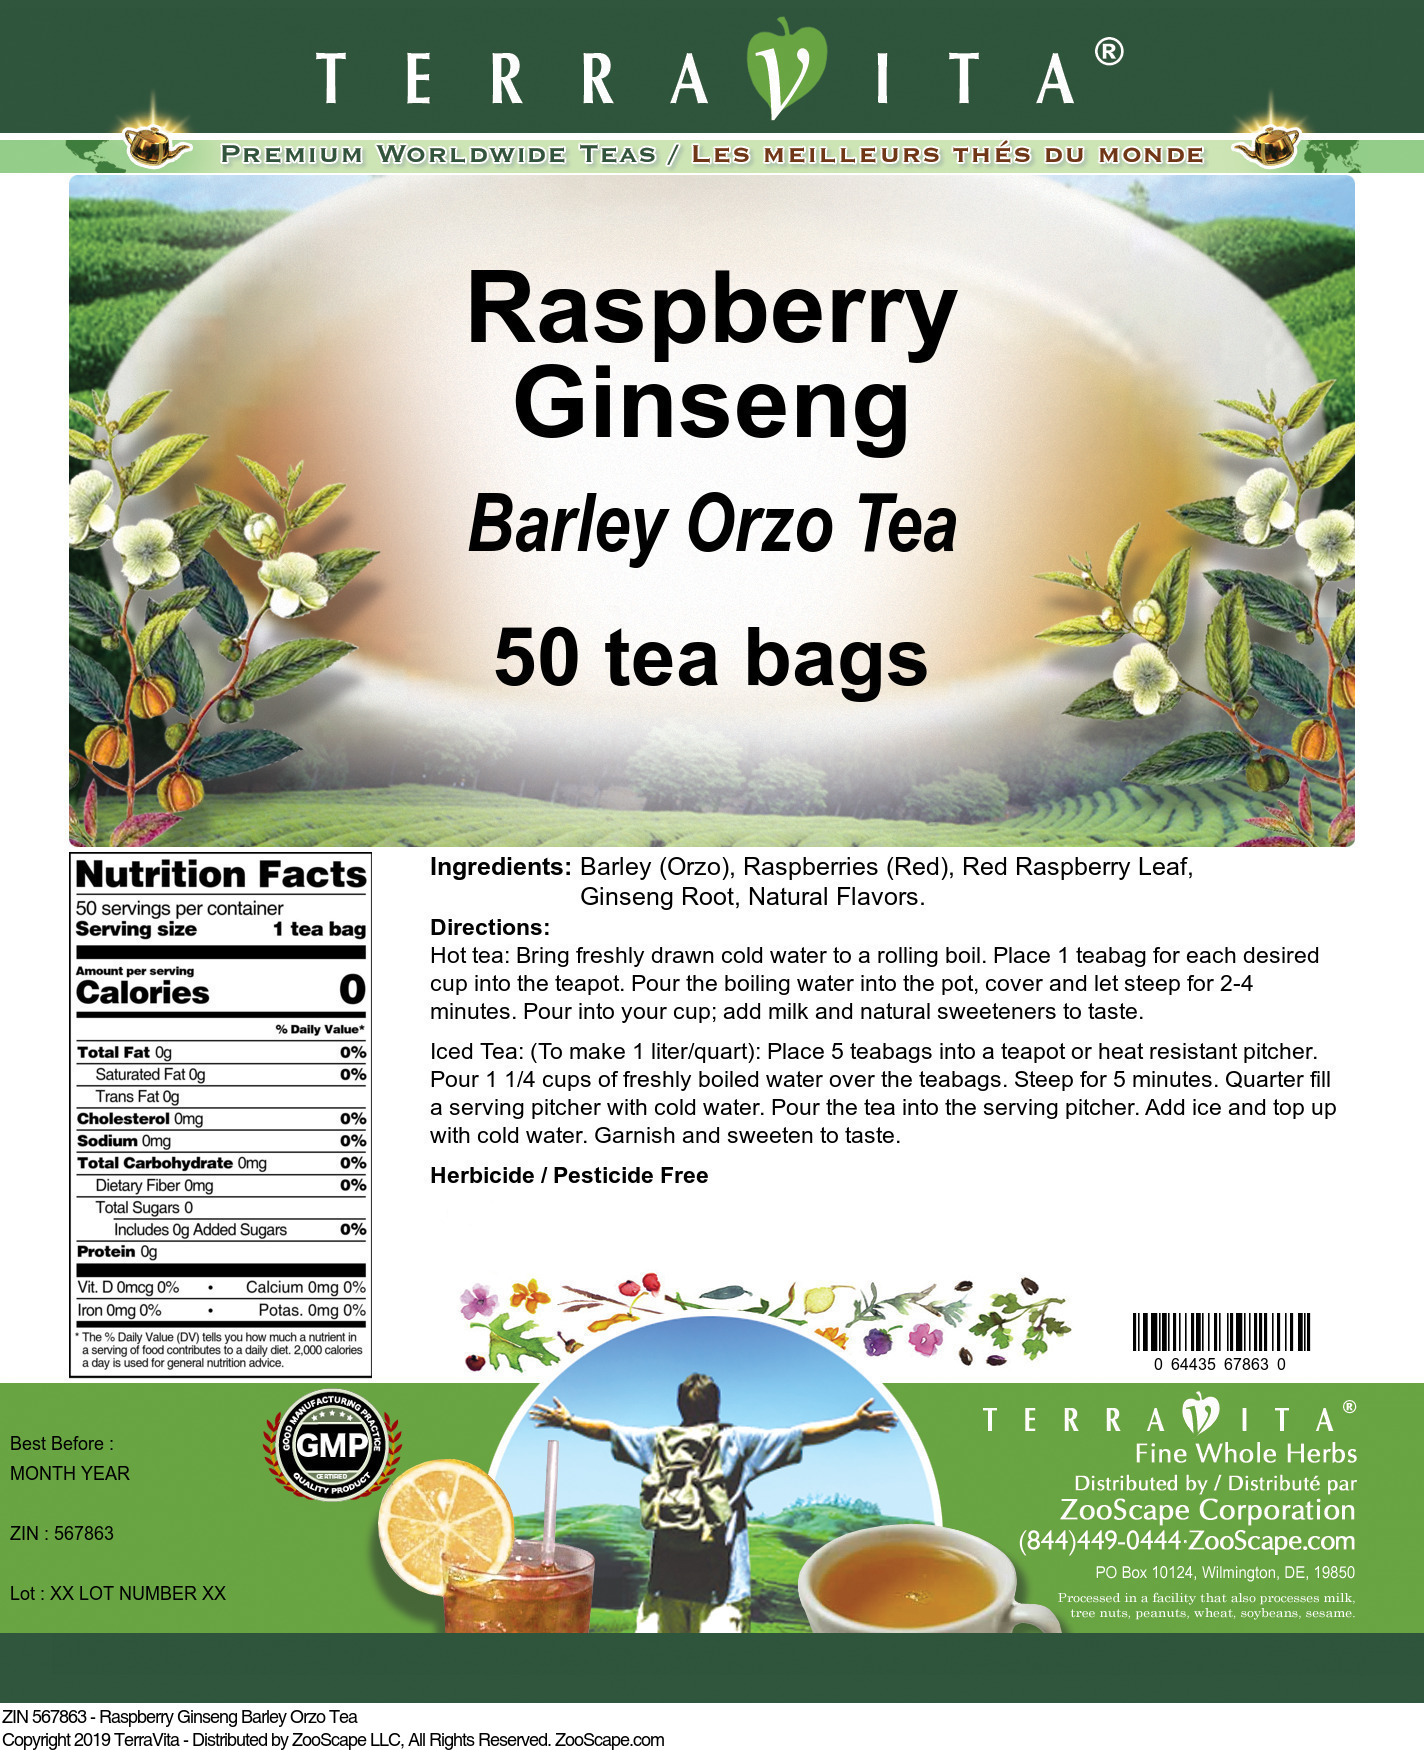 Raspberry Ginseng Barley Orzo Tea